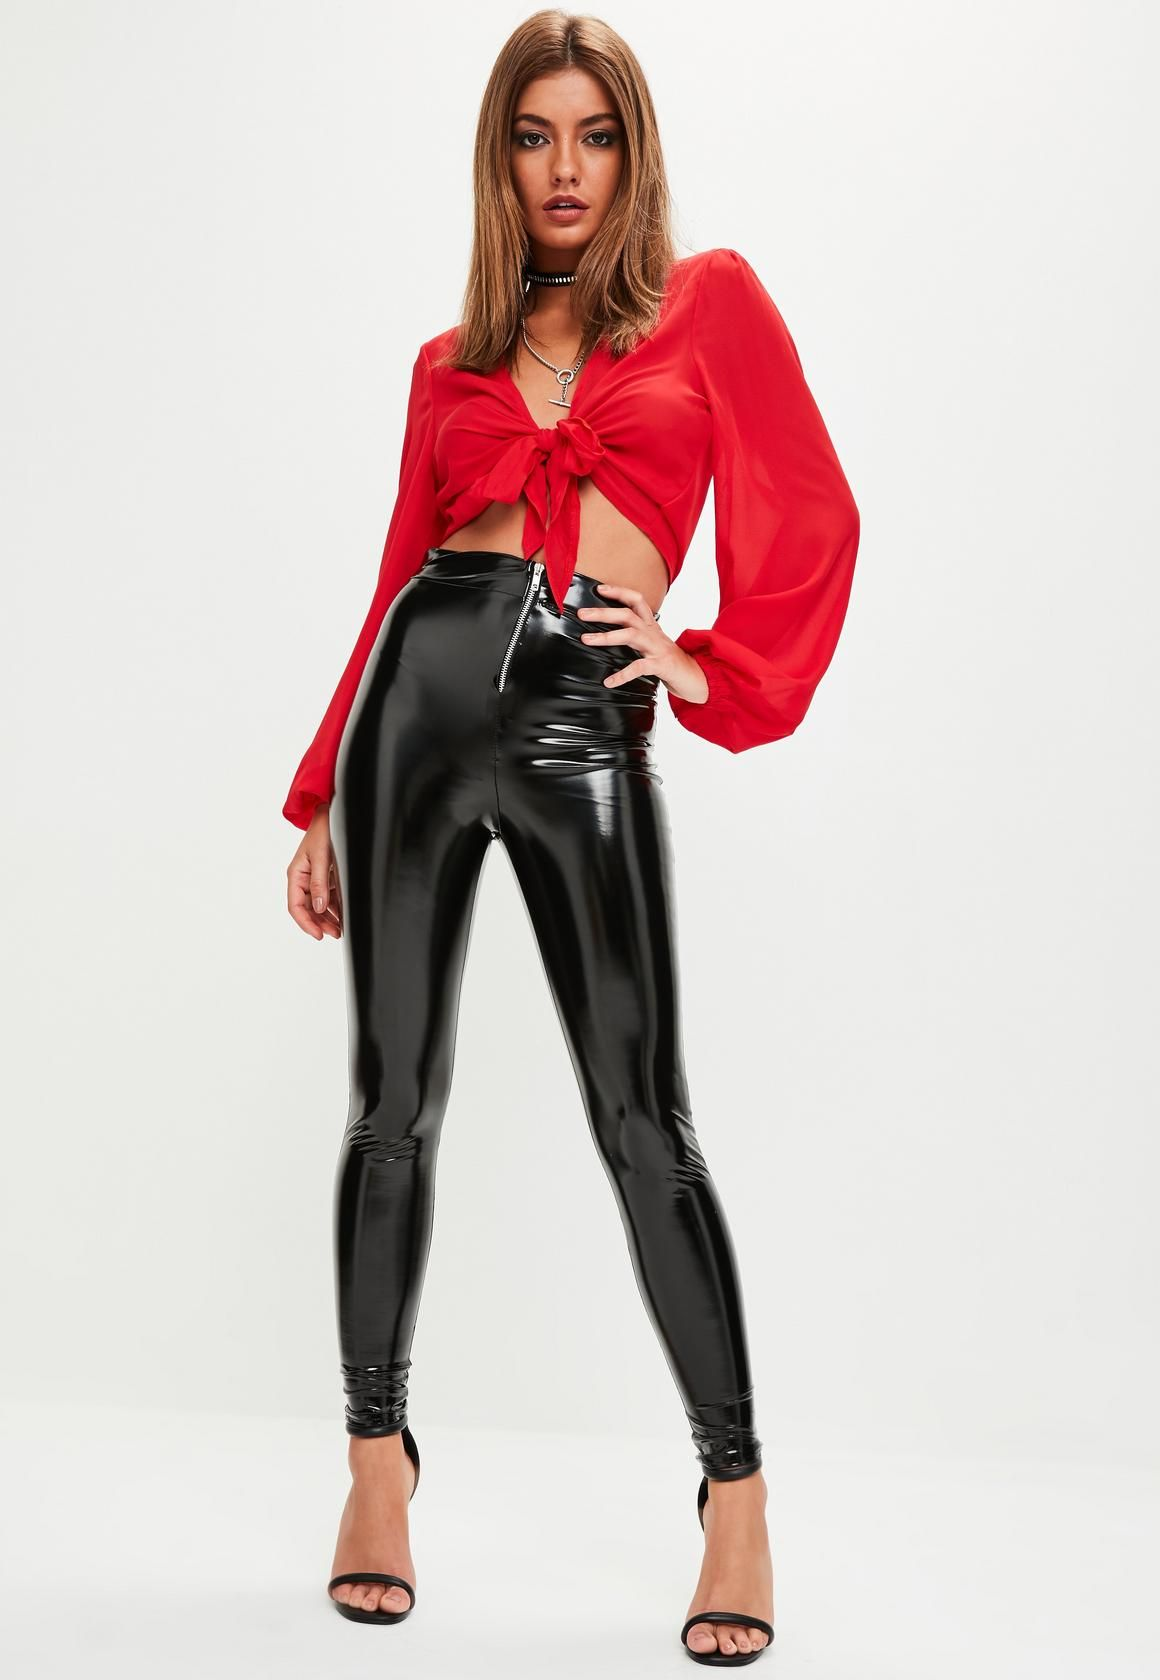 ff02a149eedff Missguided - Black Vinyl Leggings | Mode | Vinyl leggings, Vinyl ...